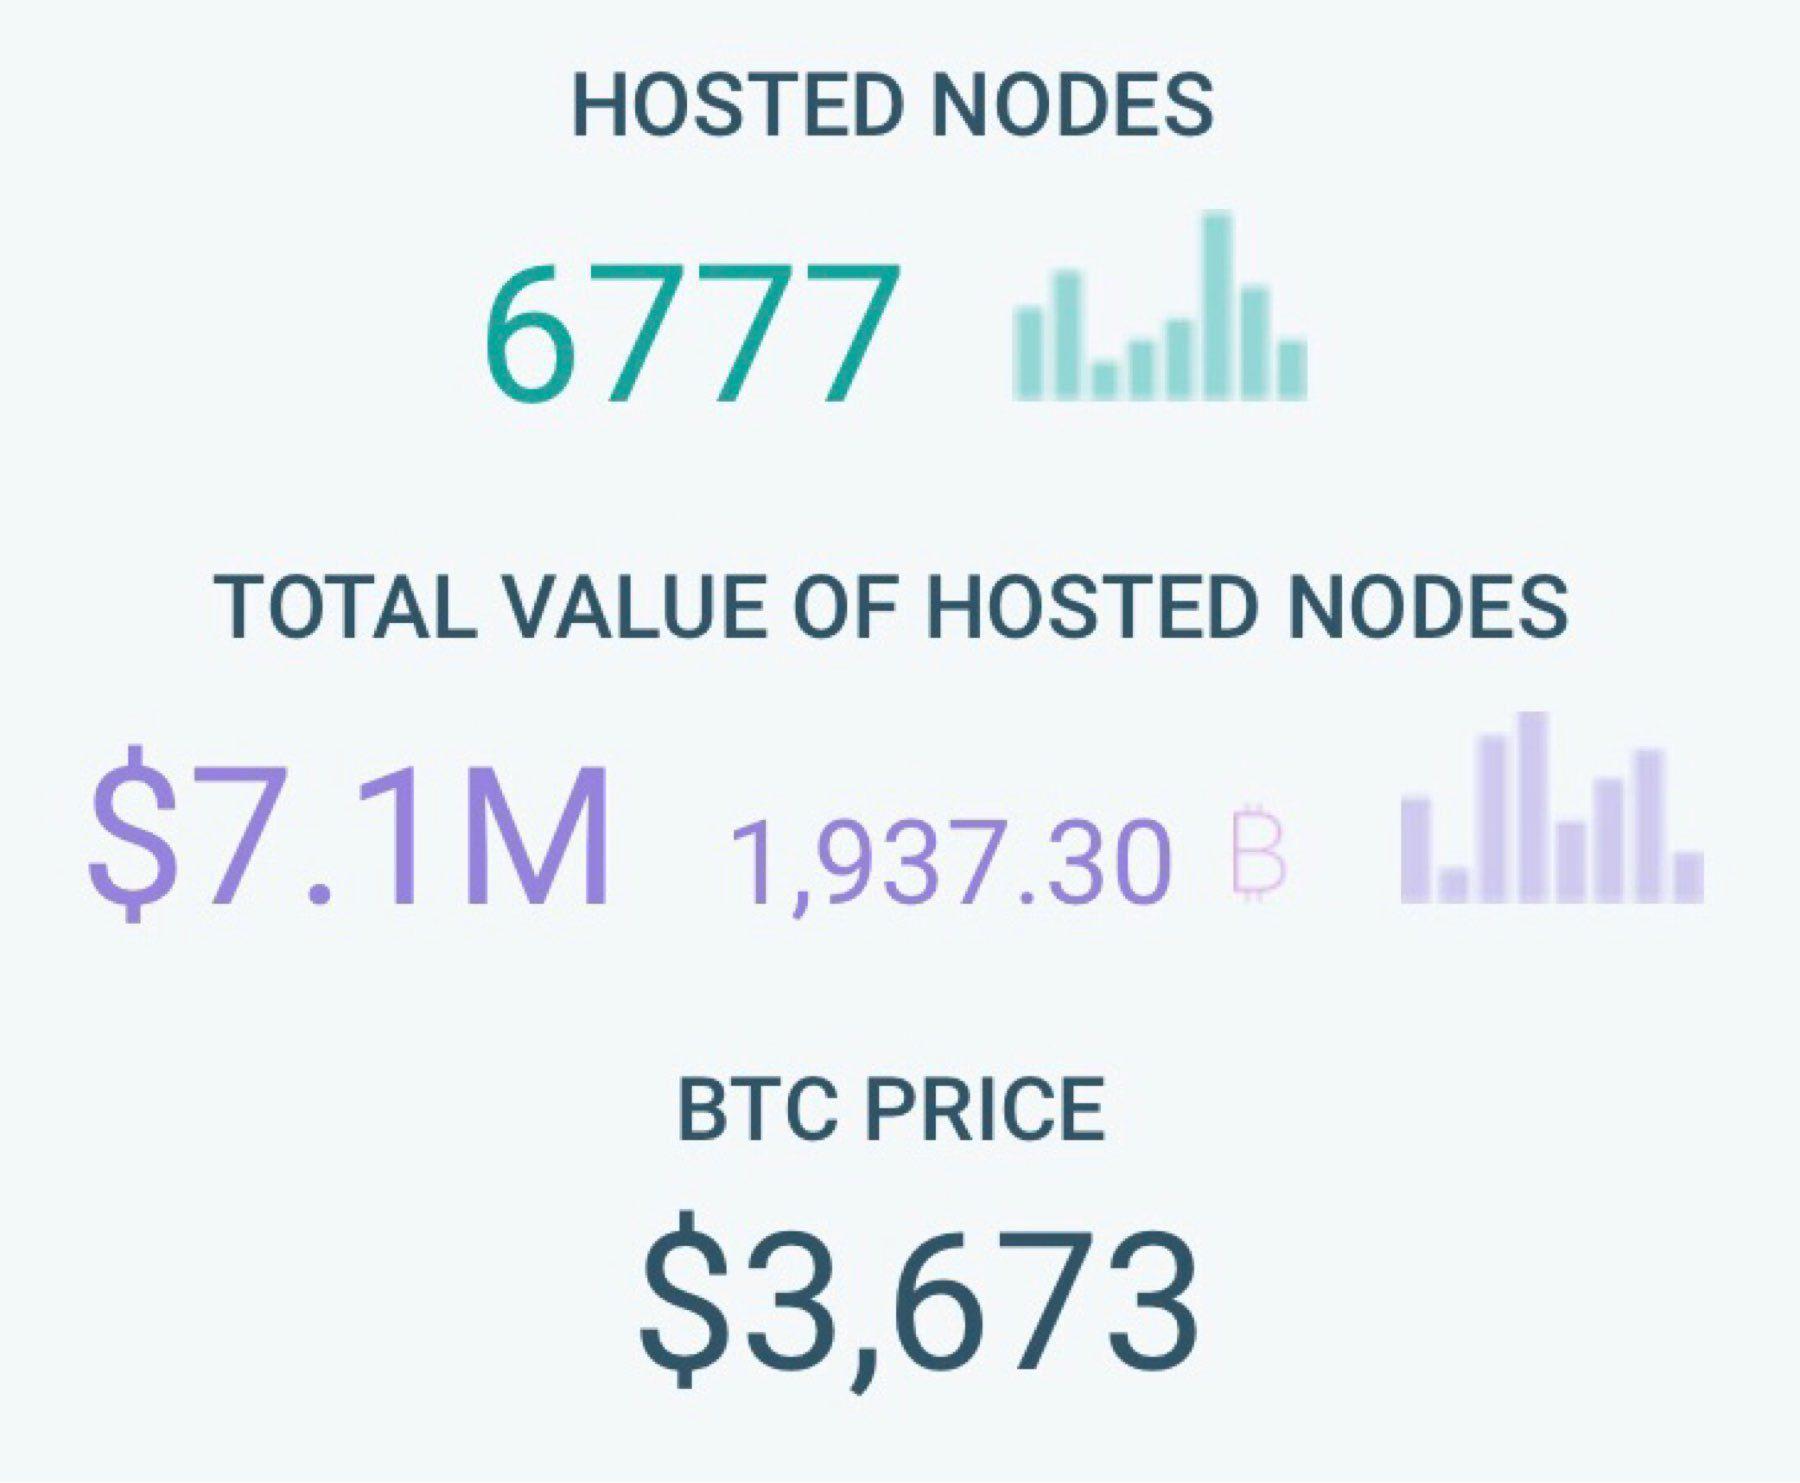 GIN node count